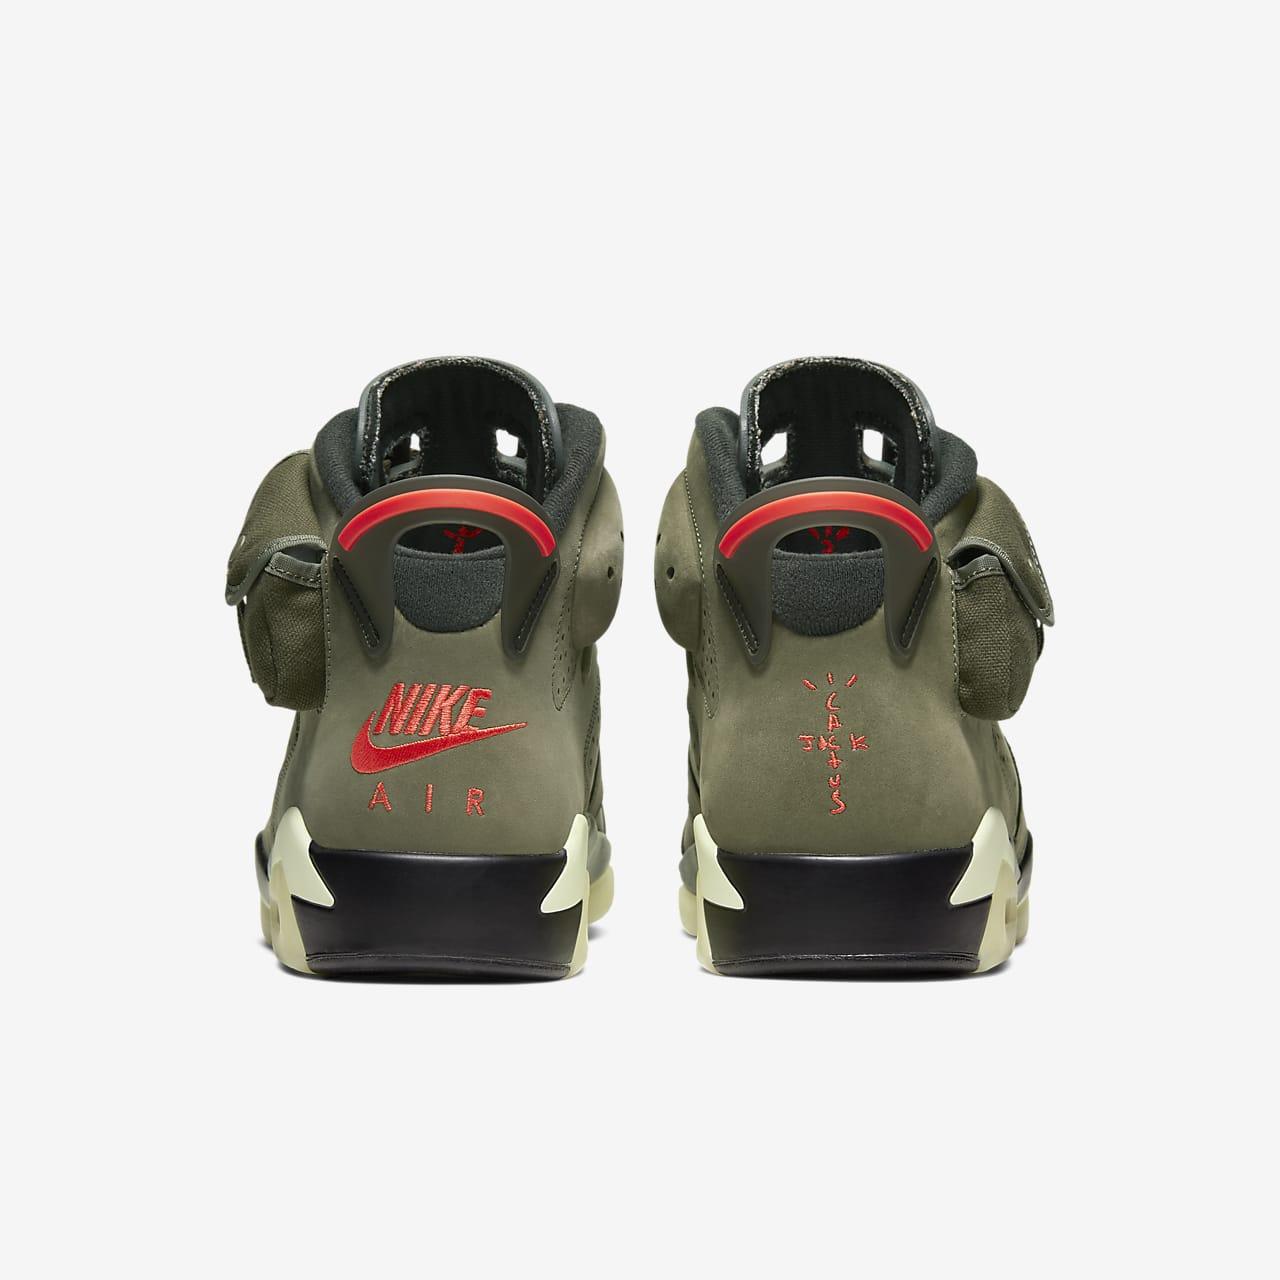 Travis Scott x Nike Air Jordan 6 Cactus Jack Where To Buy